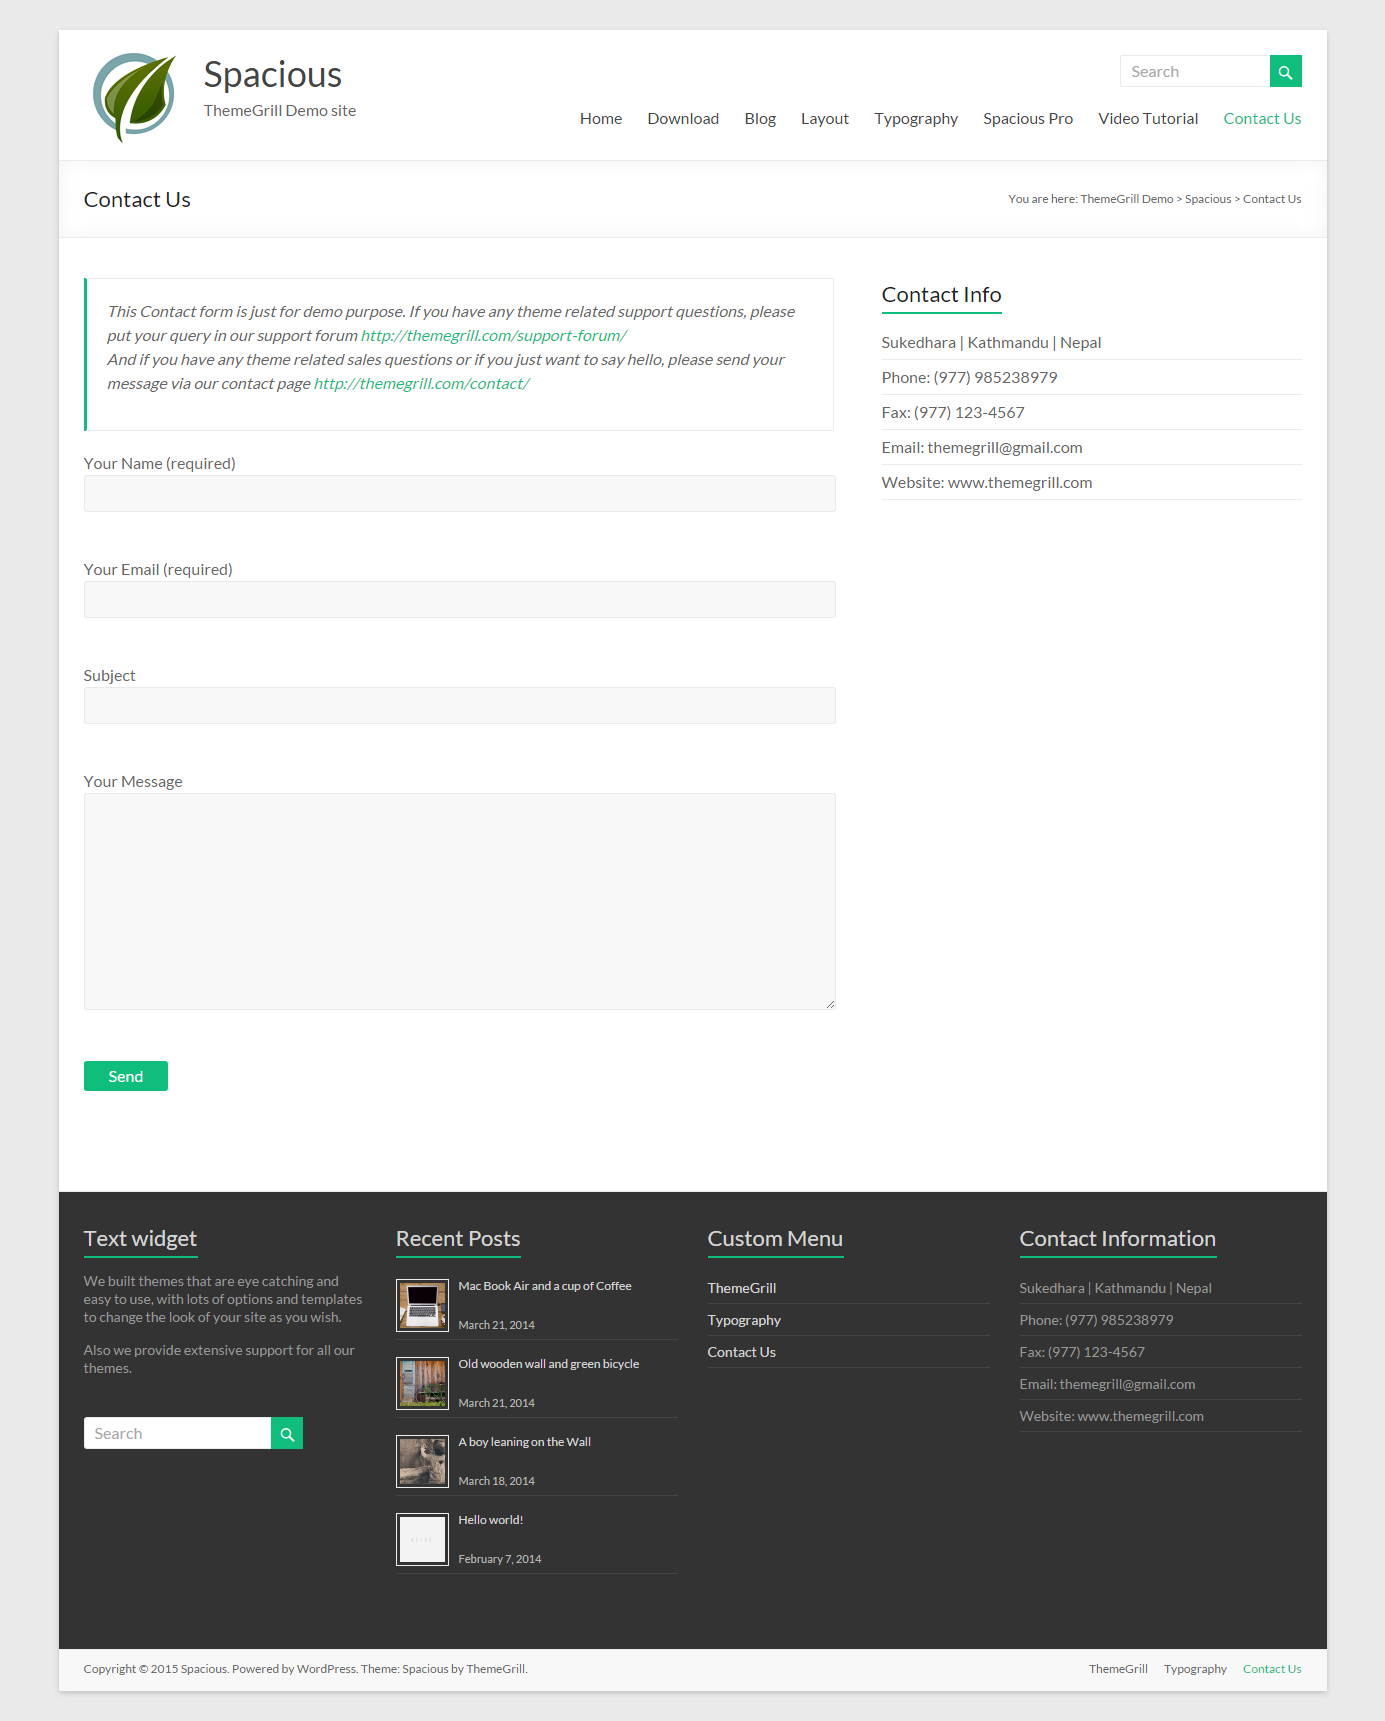 Custom themes for gmail -  Spacious Themegrill Wordpress Website Design 3